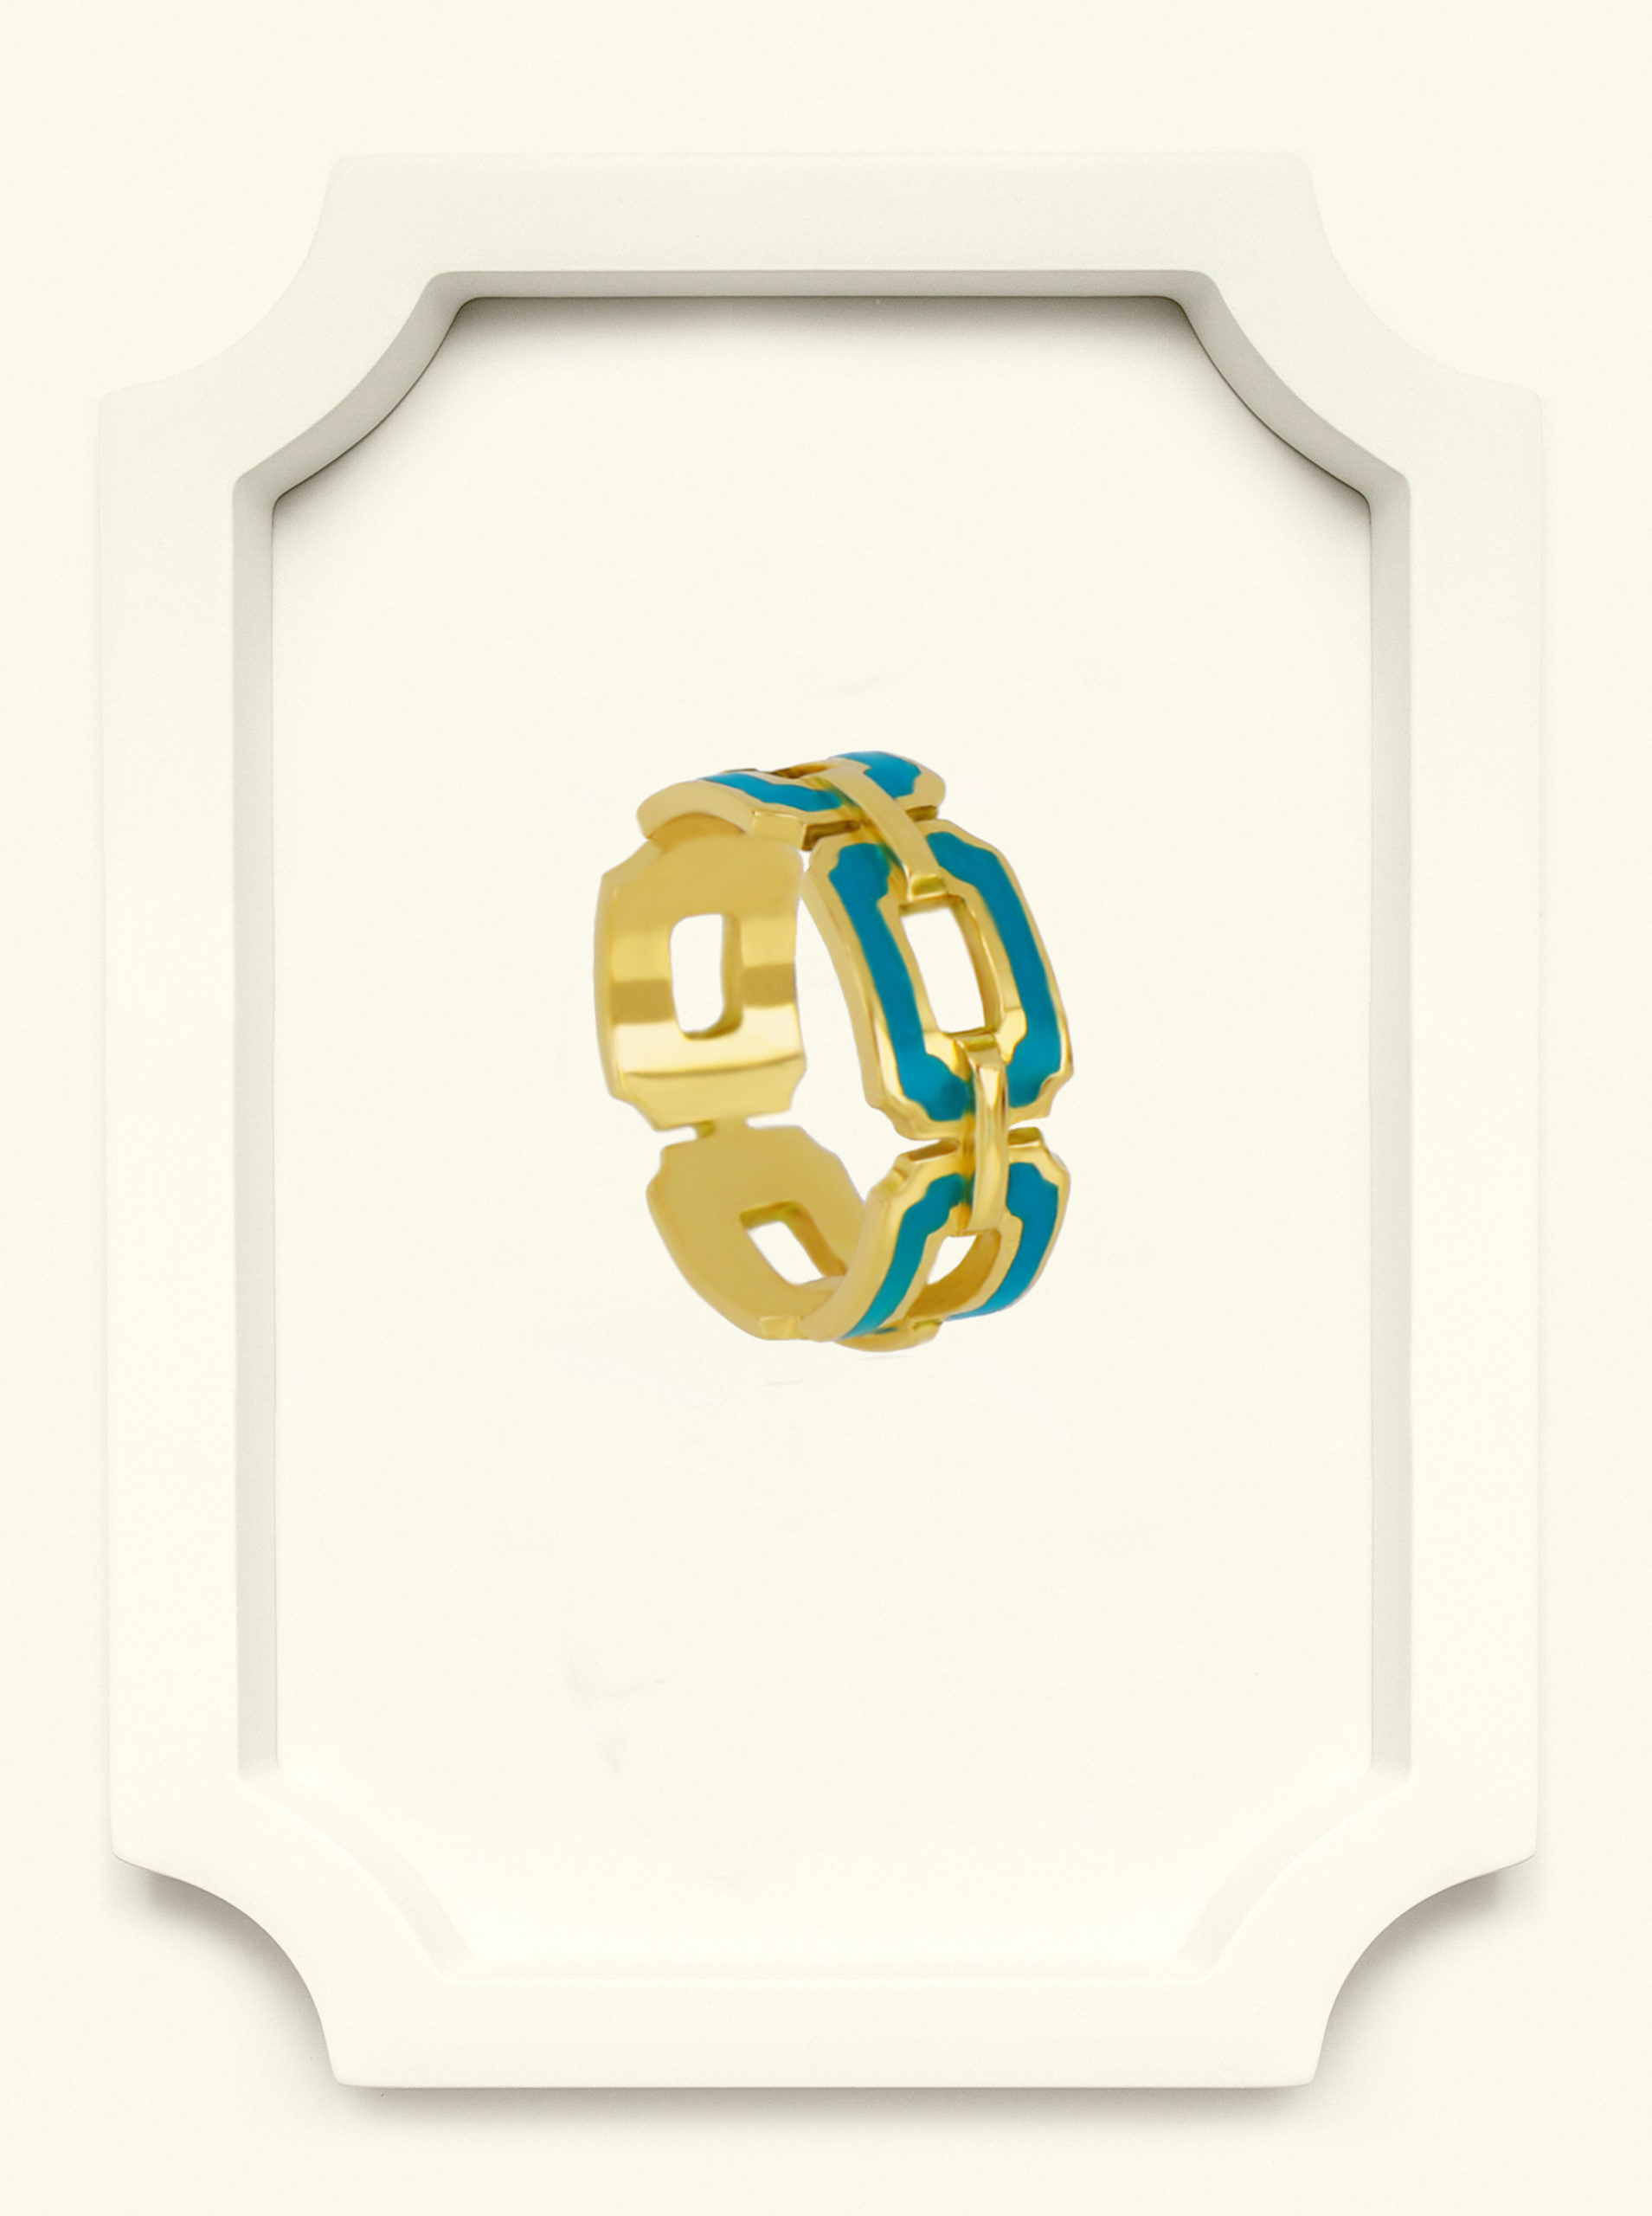 Saba Yellow Gold Signature Ring with Blue Enamel